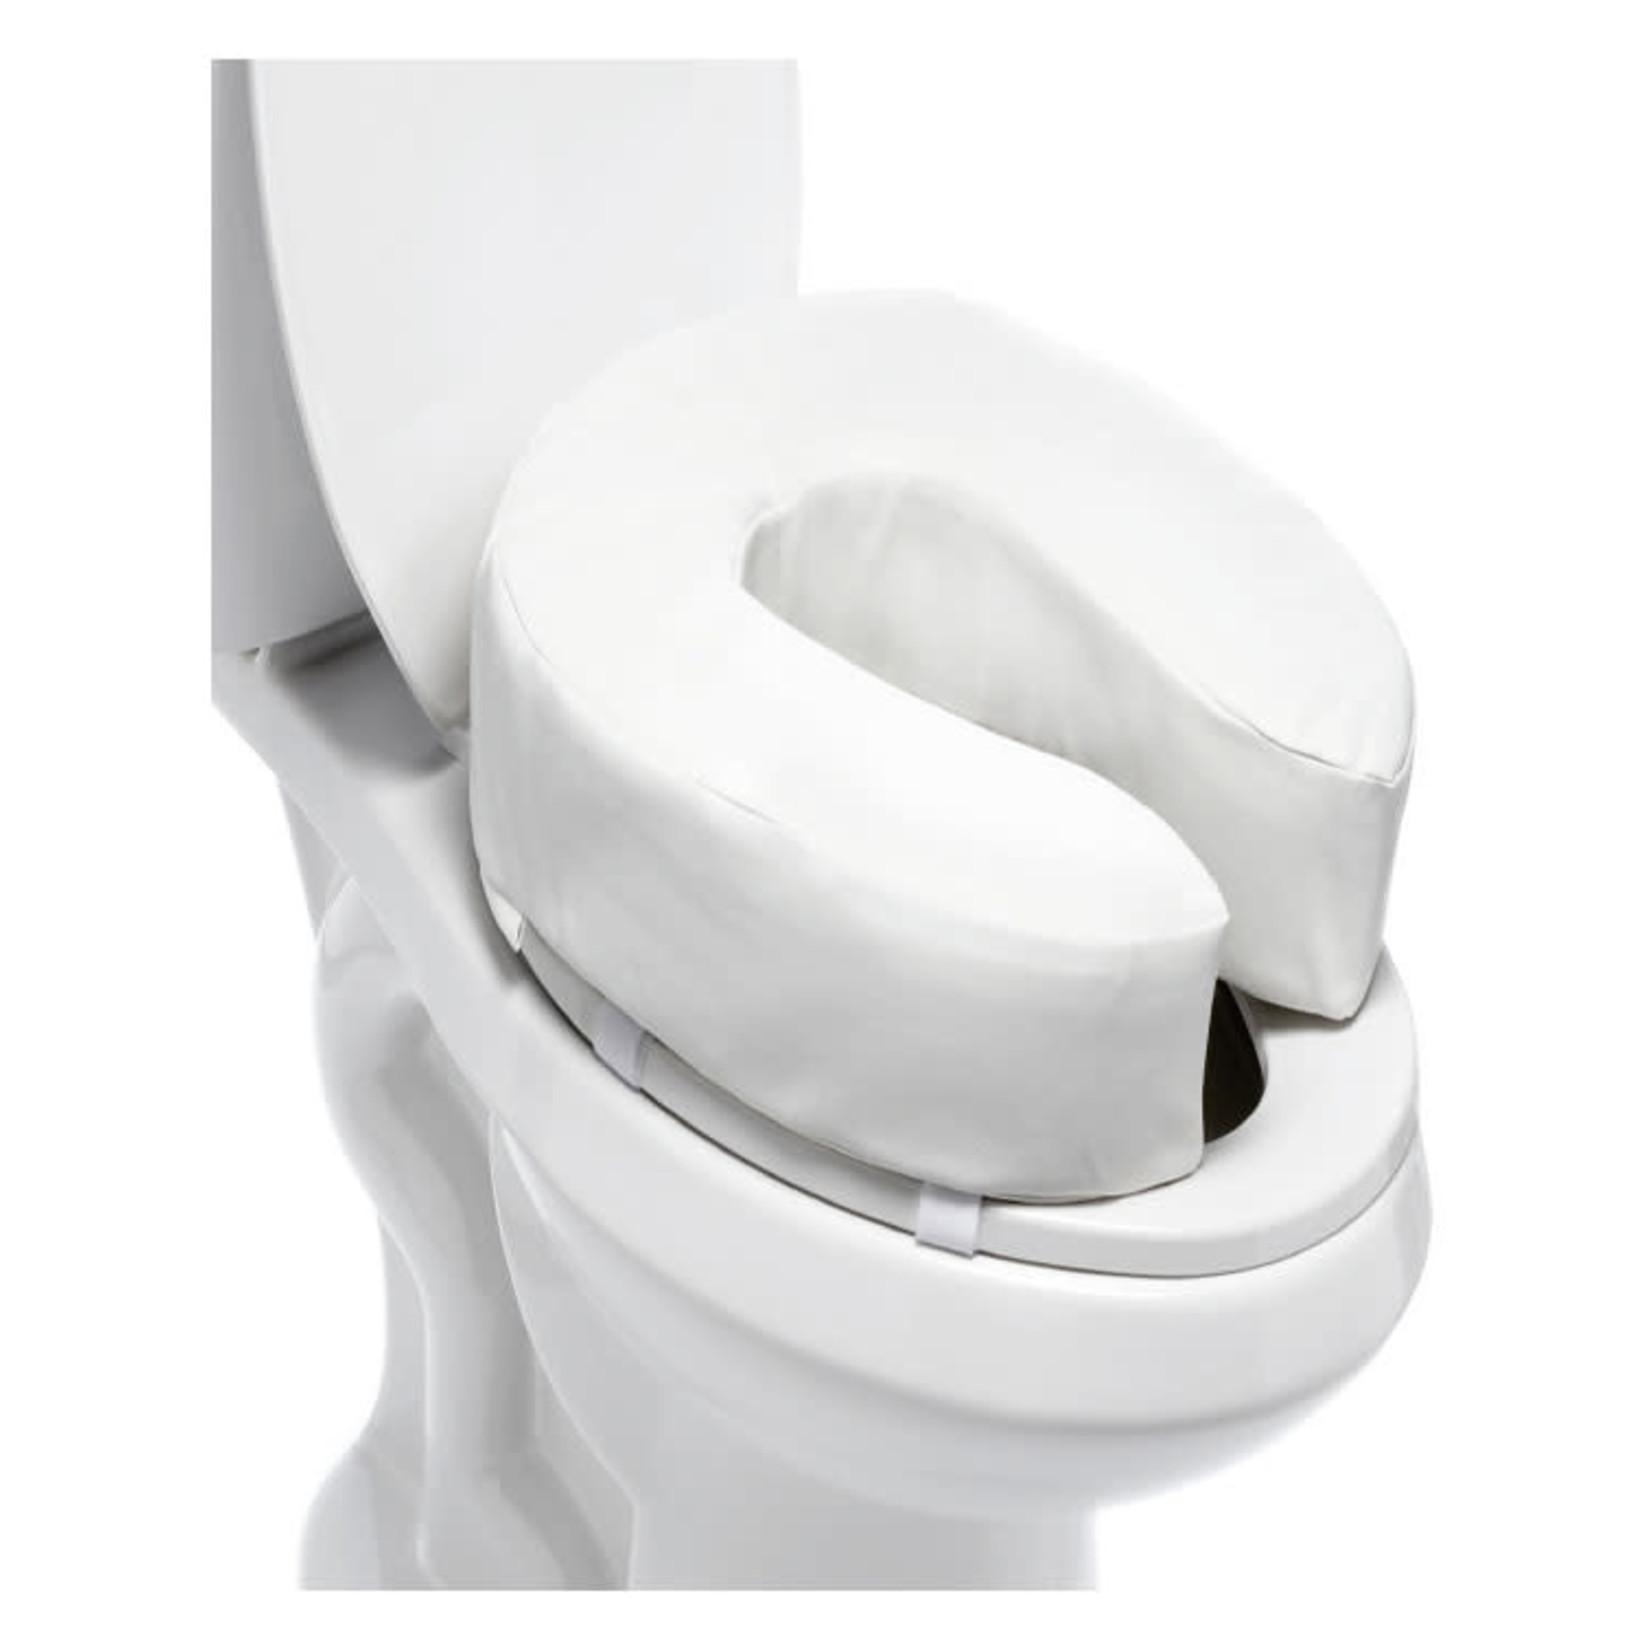 MOBB Toilet Seat Riser - Foam - 4''